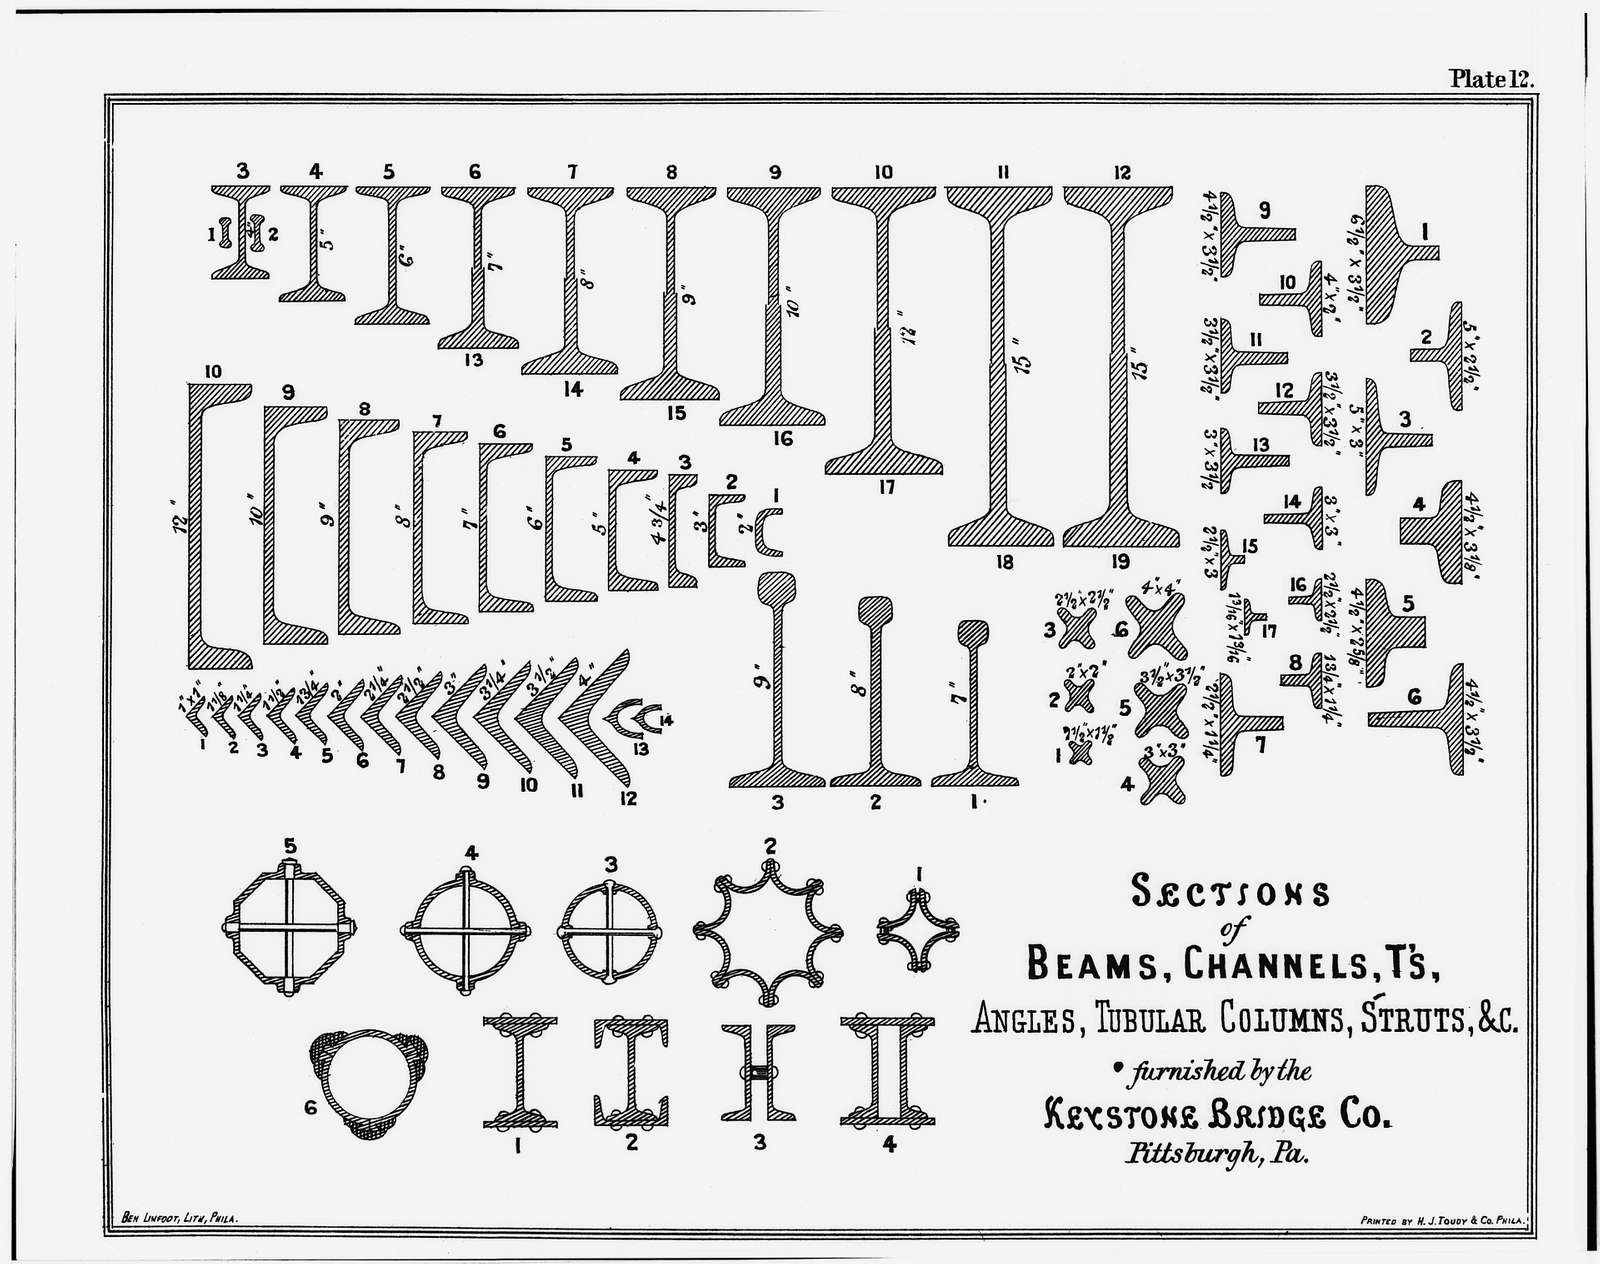 Baltimore & Ohio Railroad, Parkersburg Bridge, Ohio River, Parkersburg, Wood County, WV